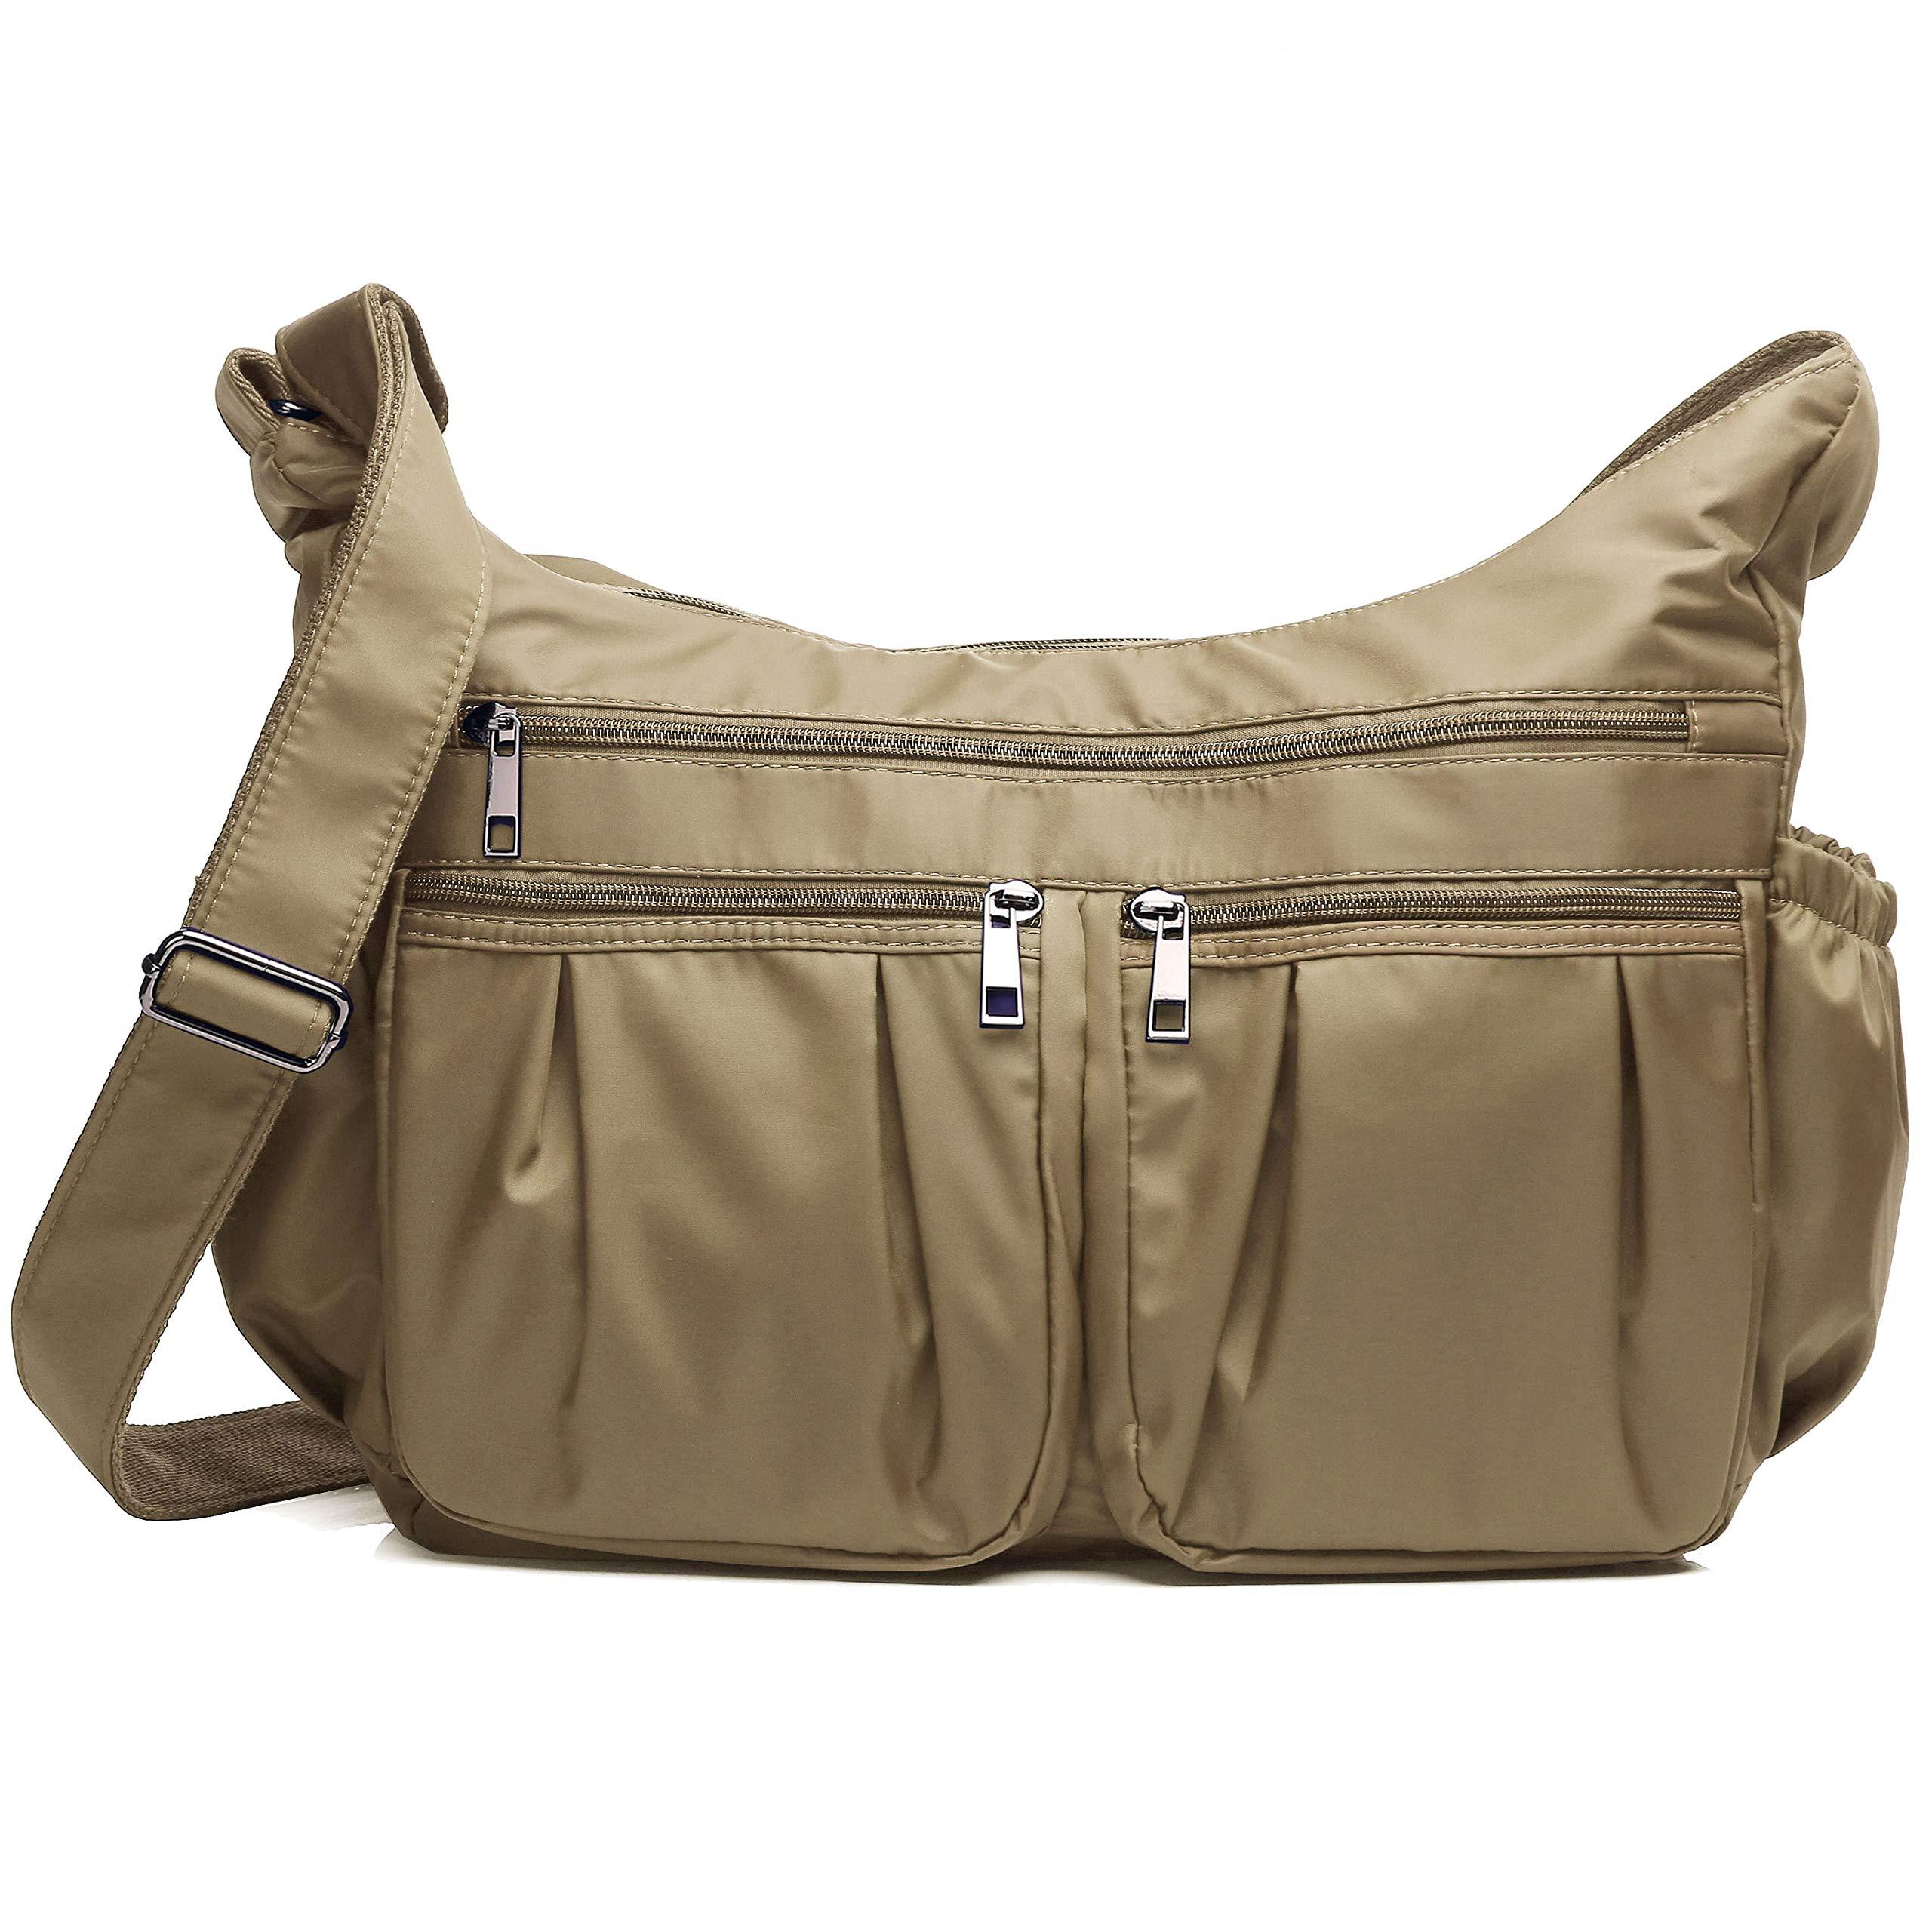 Crossbody Bags for Women, Multi Pocket Shoulder Bag Waterproof Nylon Travel Purses and Handbags (8981_Khaki-Large)